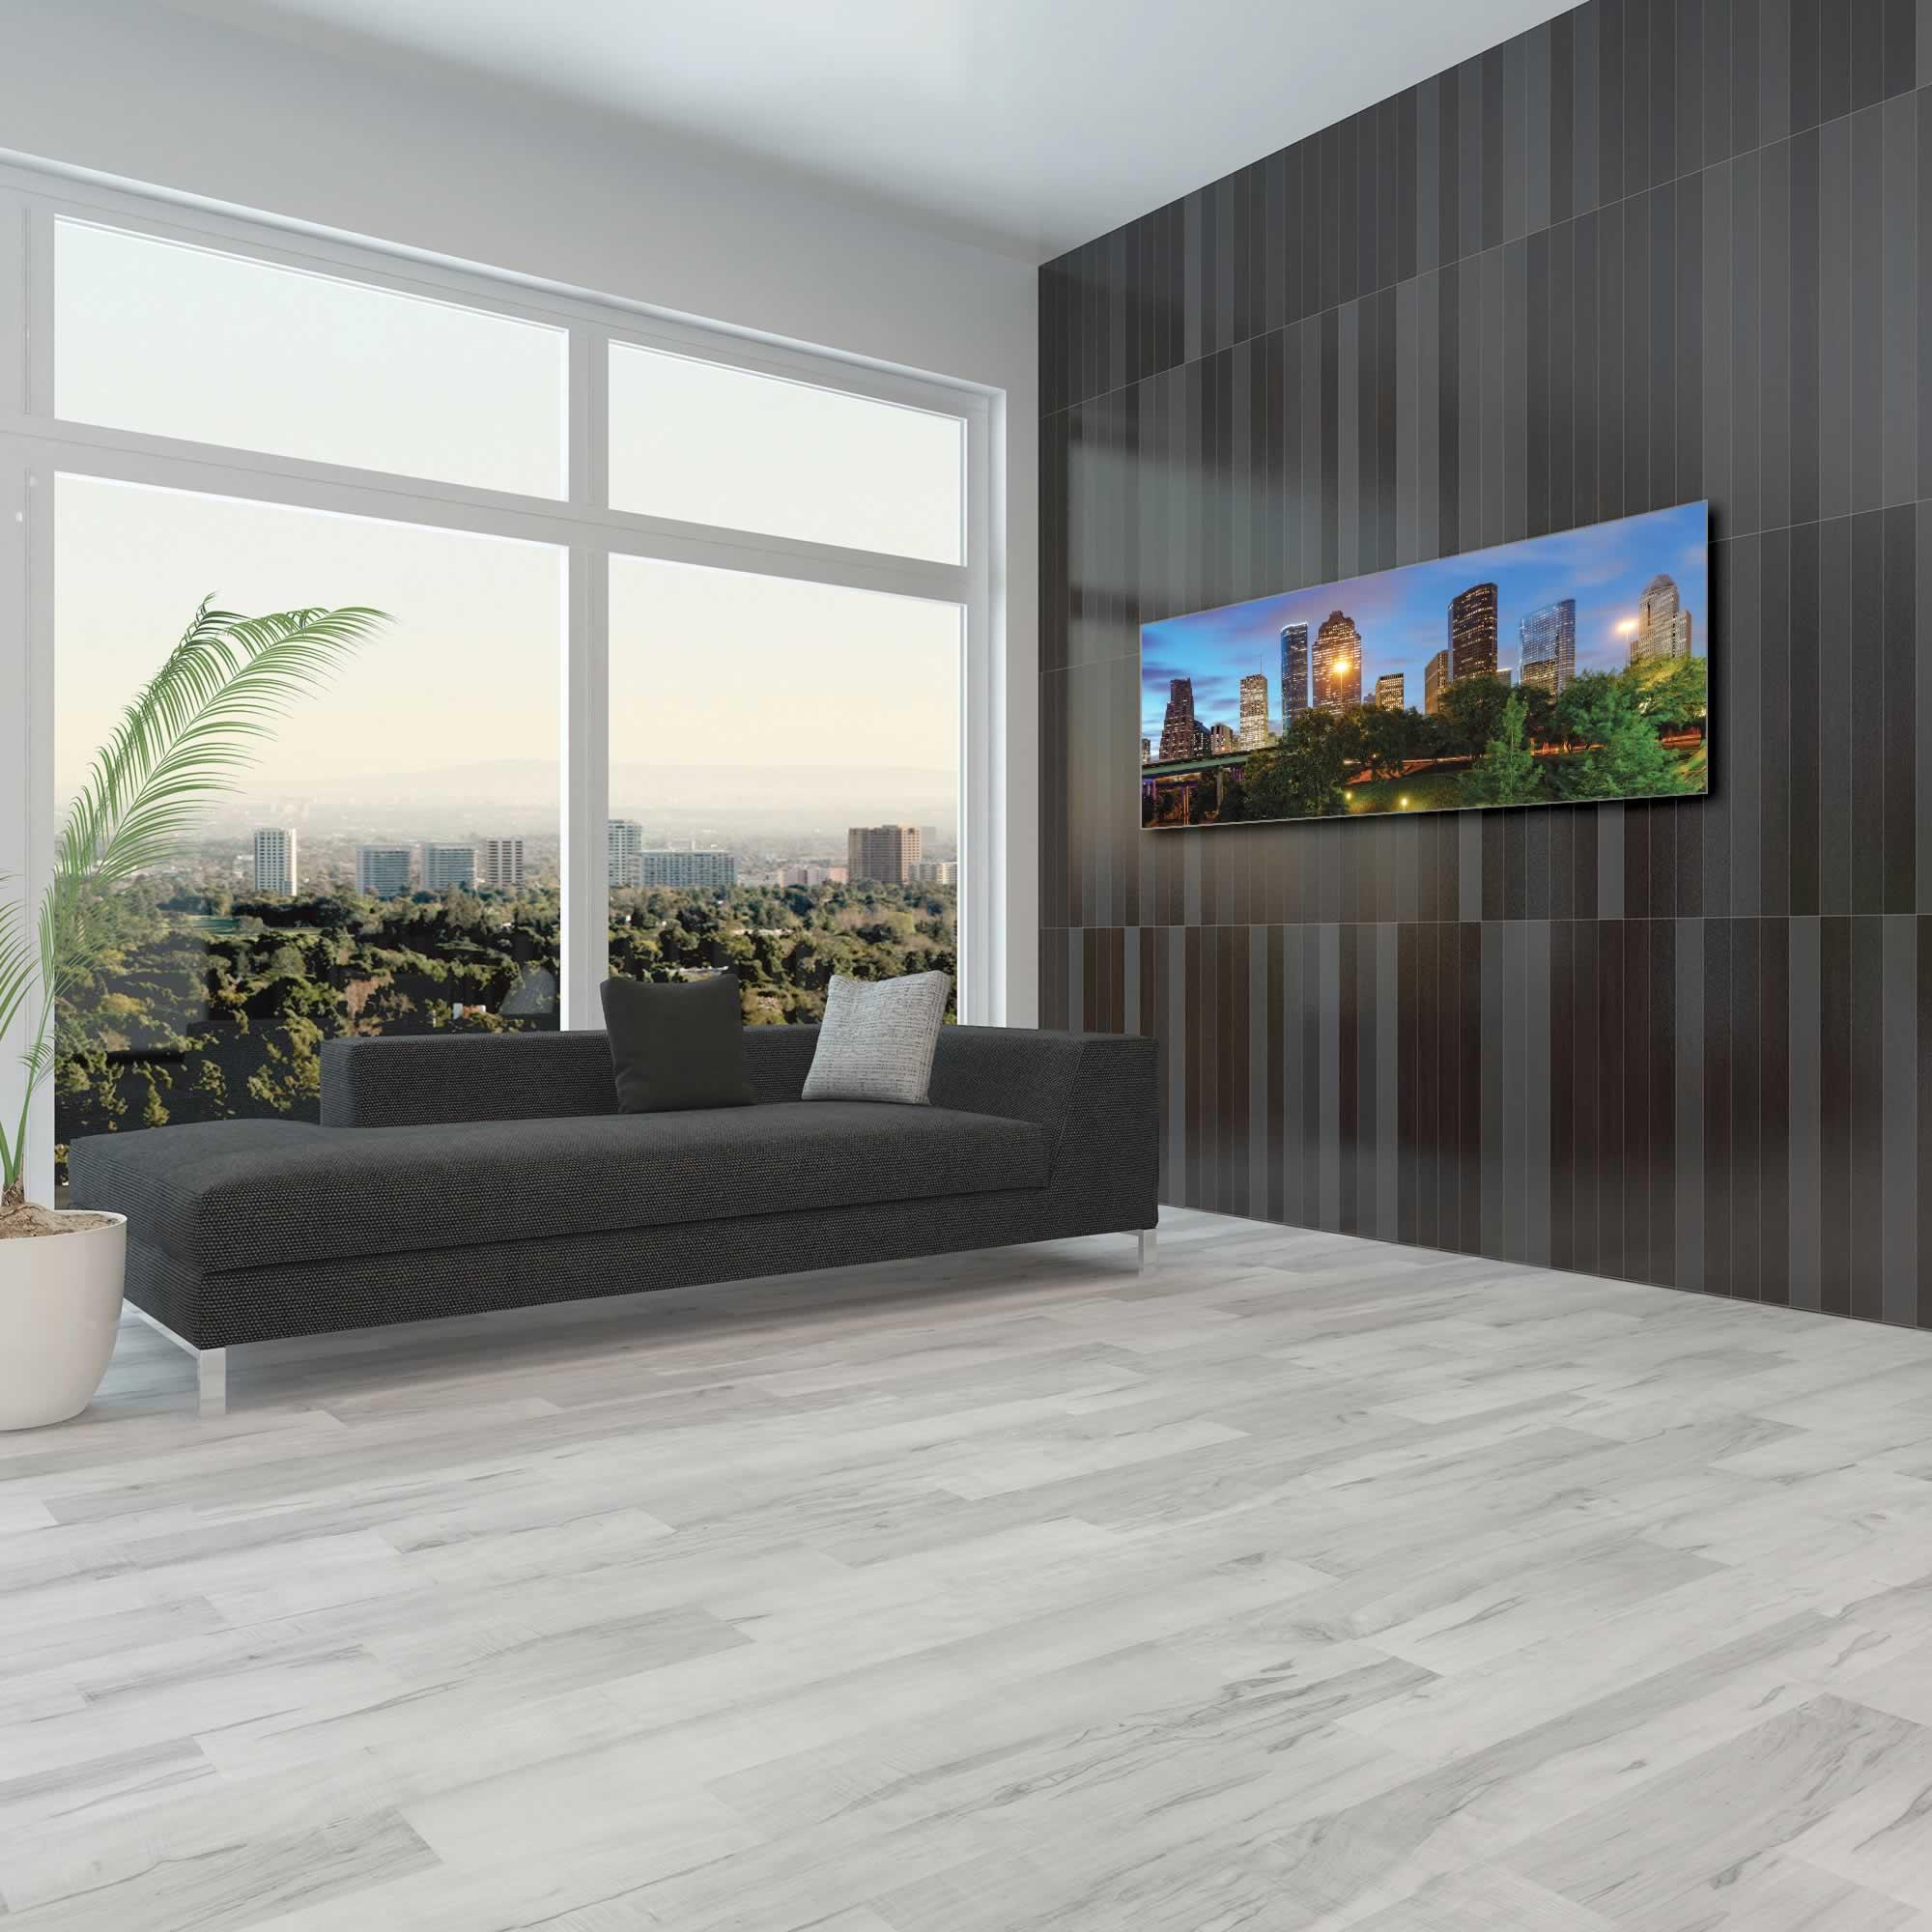 Houston City Skyline - Urban Modern Art, Designer Home Decor, Cityscape Wall Artwork, Trendy Contemporary Art - Alternate View 1